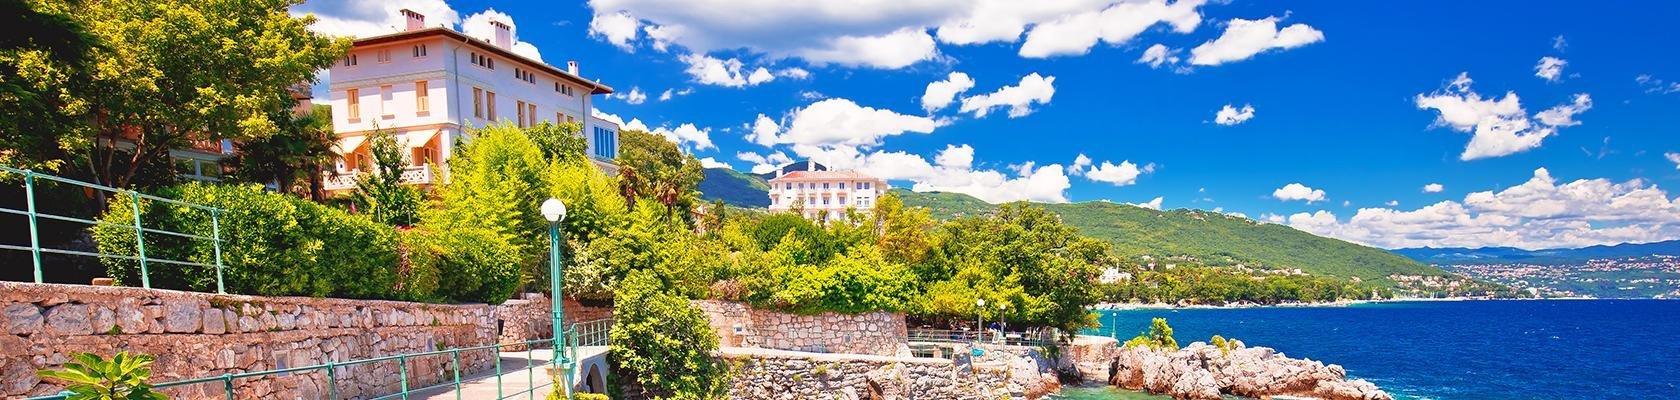 Relaxte rondreizen Kroatië